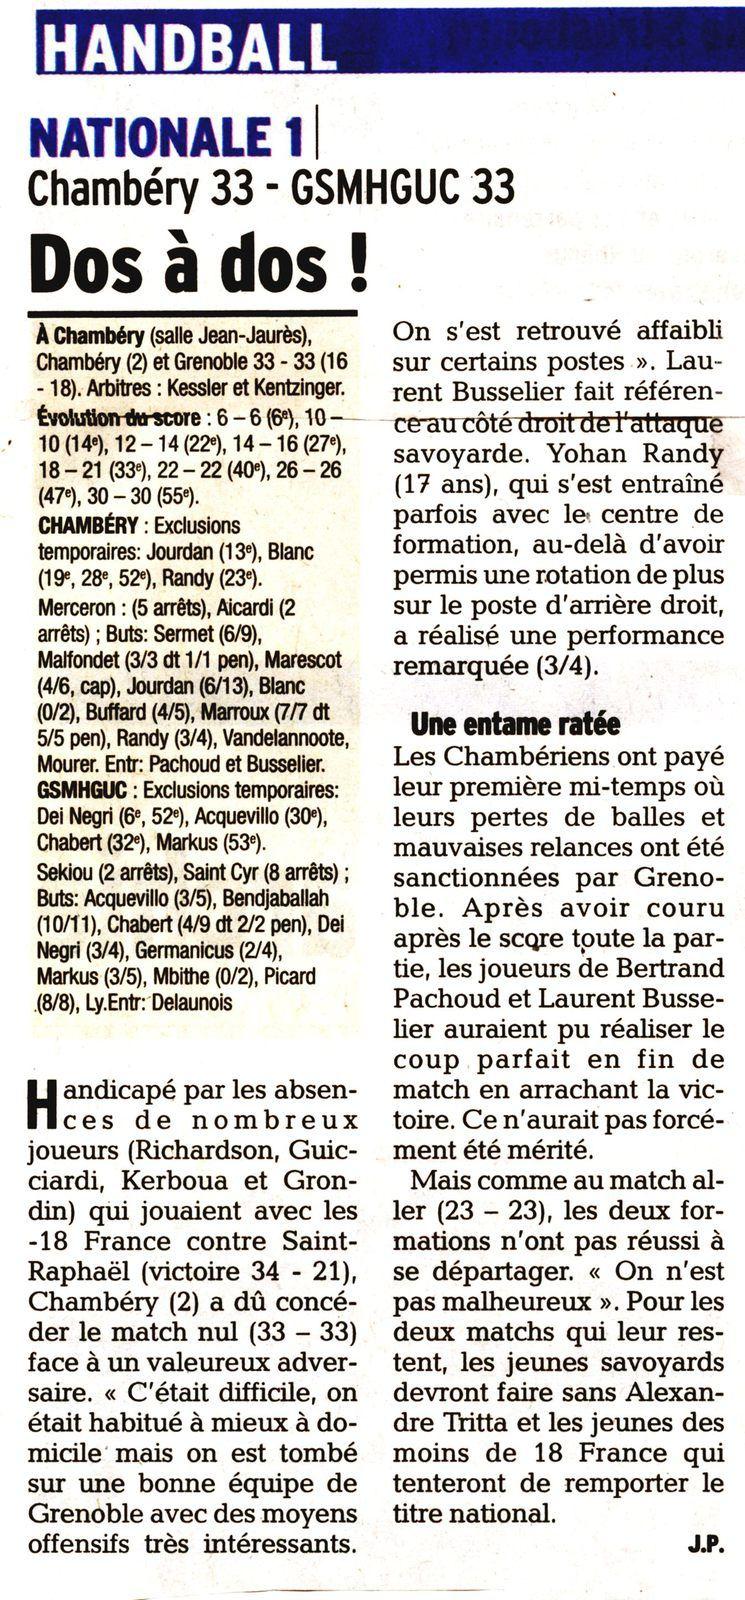 Article du DL N1 CHAMBERY - GRENOBLE 4 mai 2014